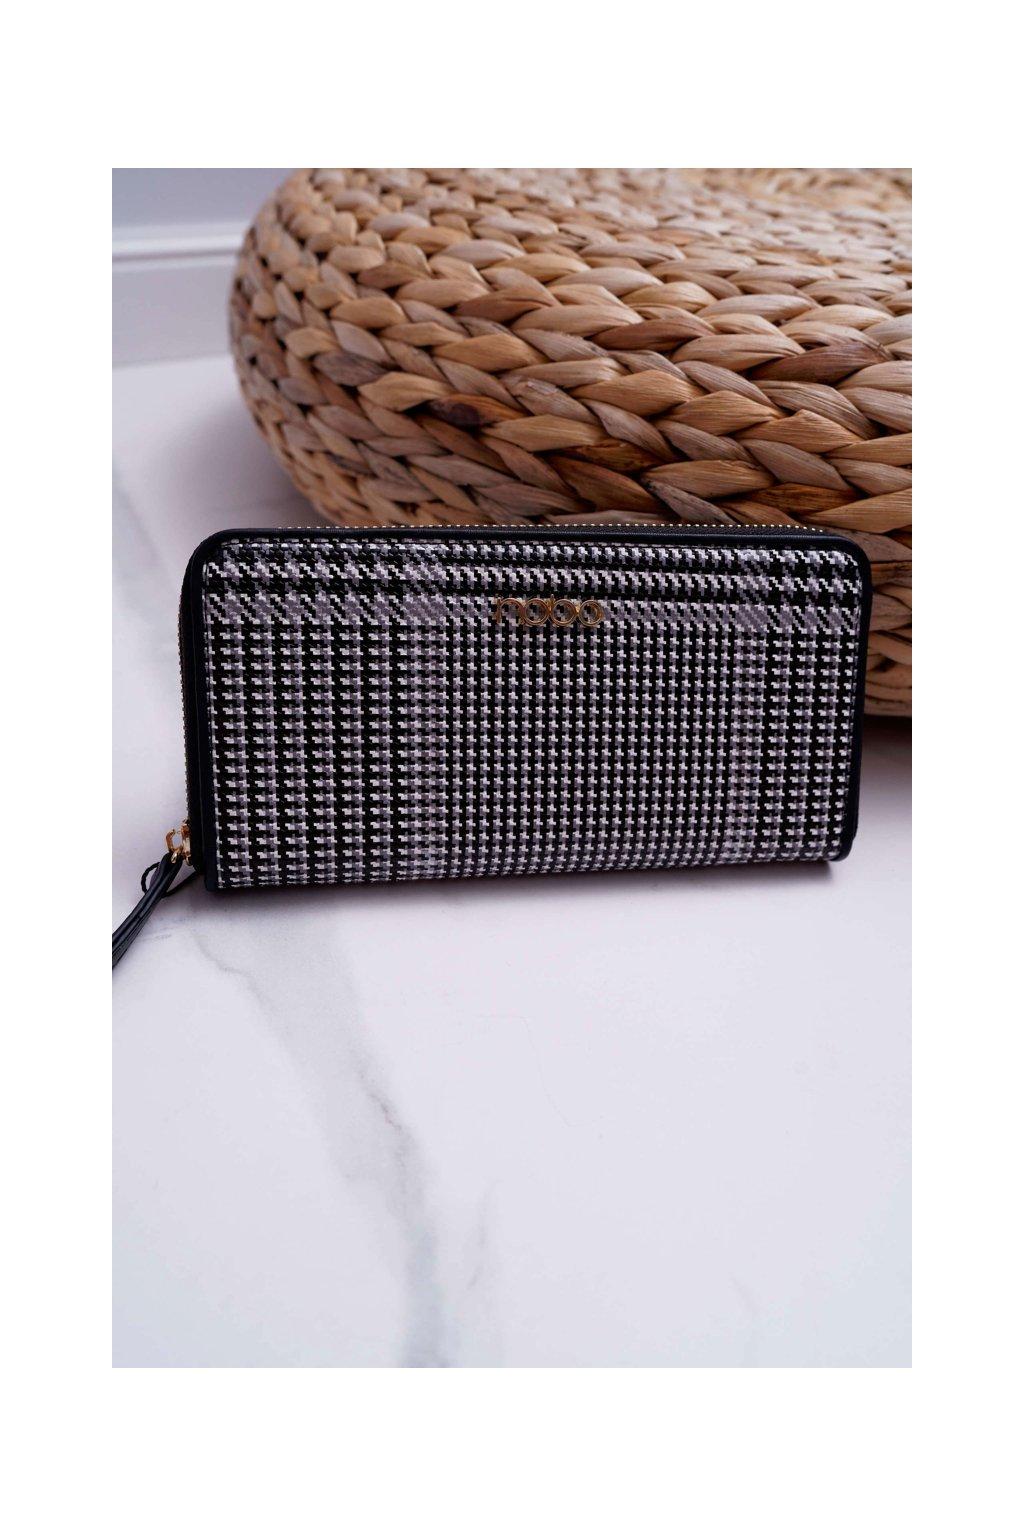 Dámska Peňaženka Klasická čierna NPUR-H0061-CM20